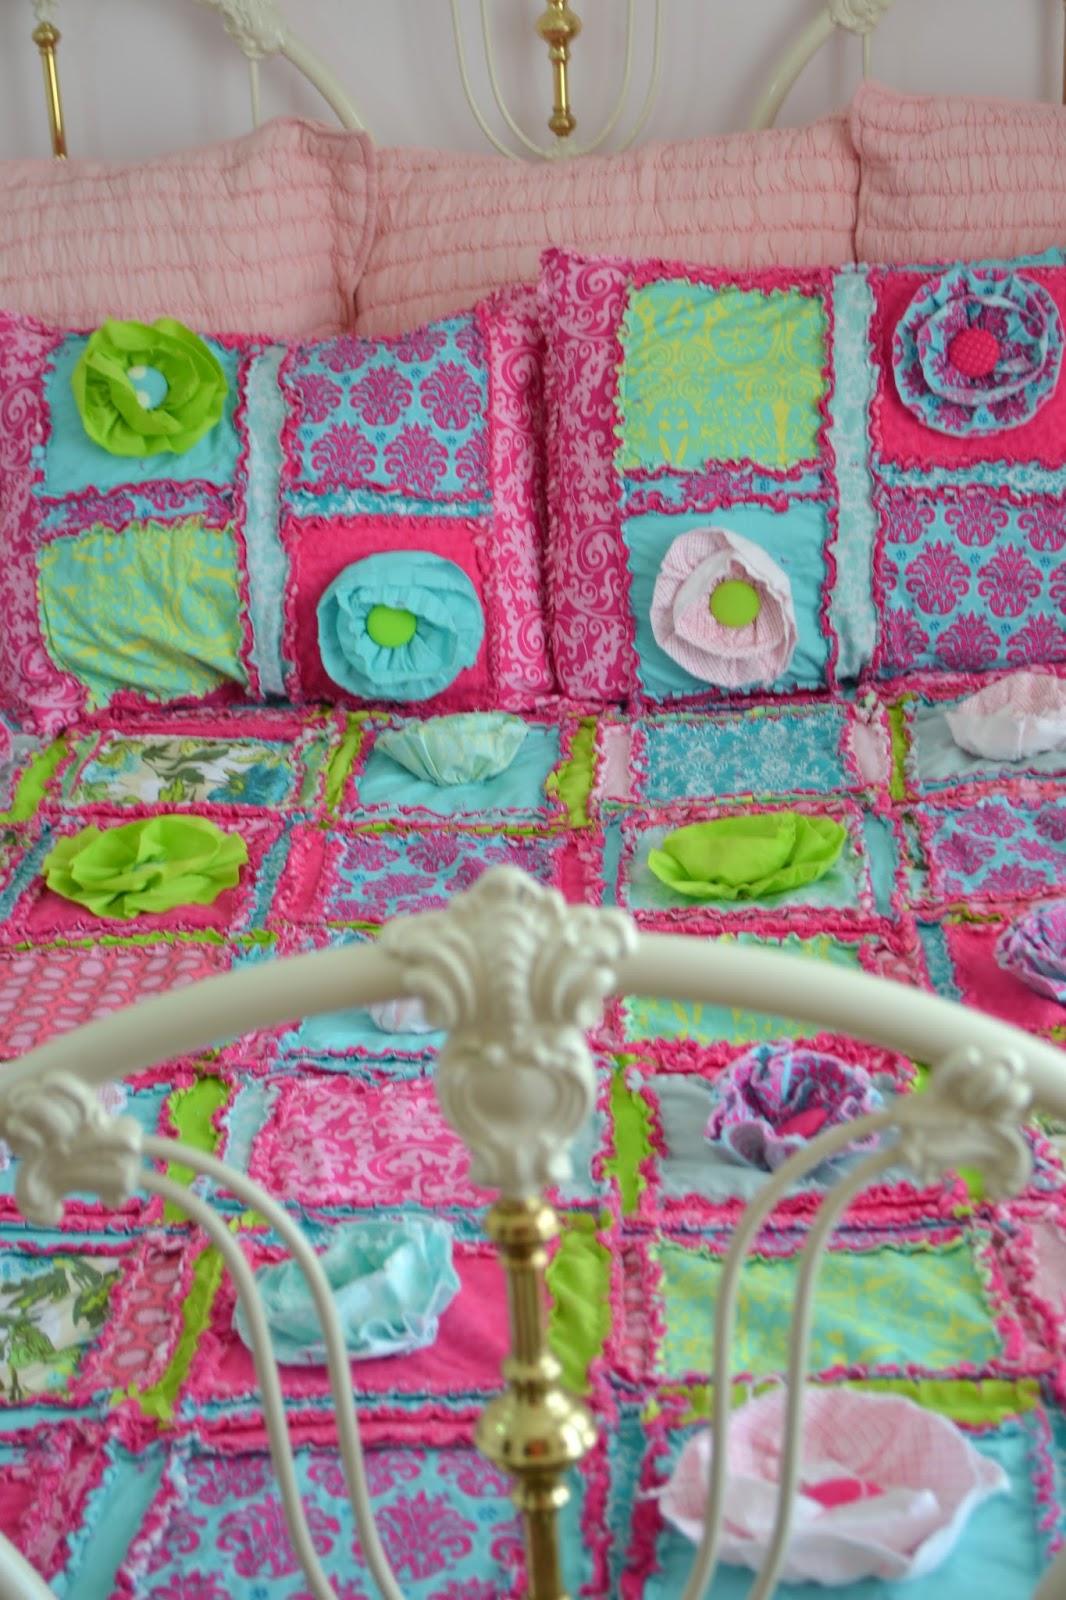 Ruffle Flower Queen Size Bed Set for Little Girl